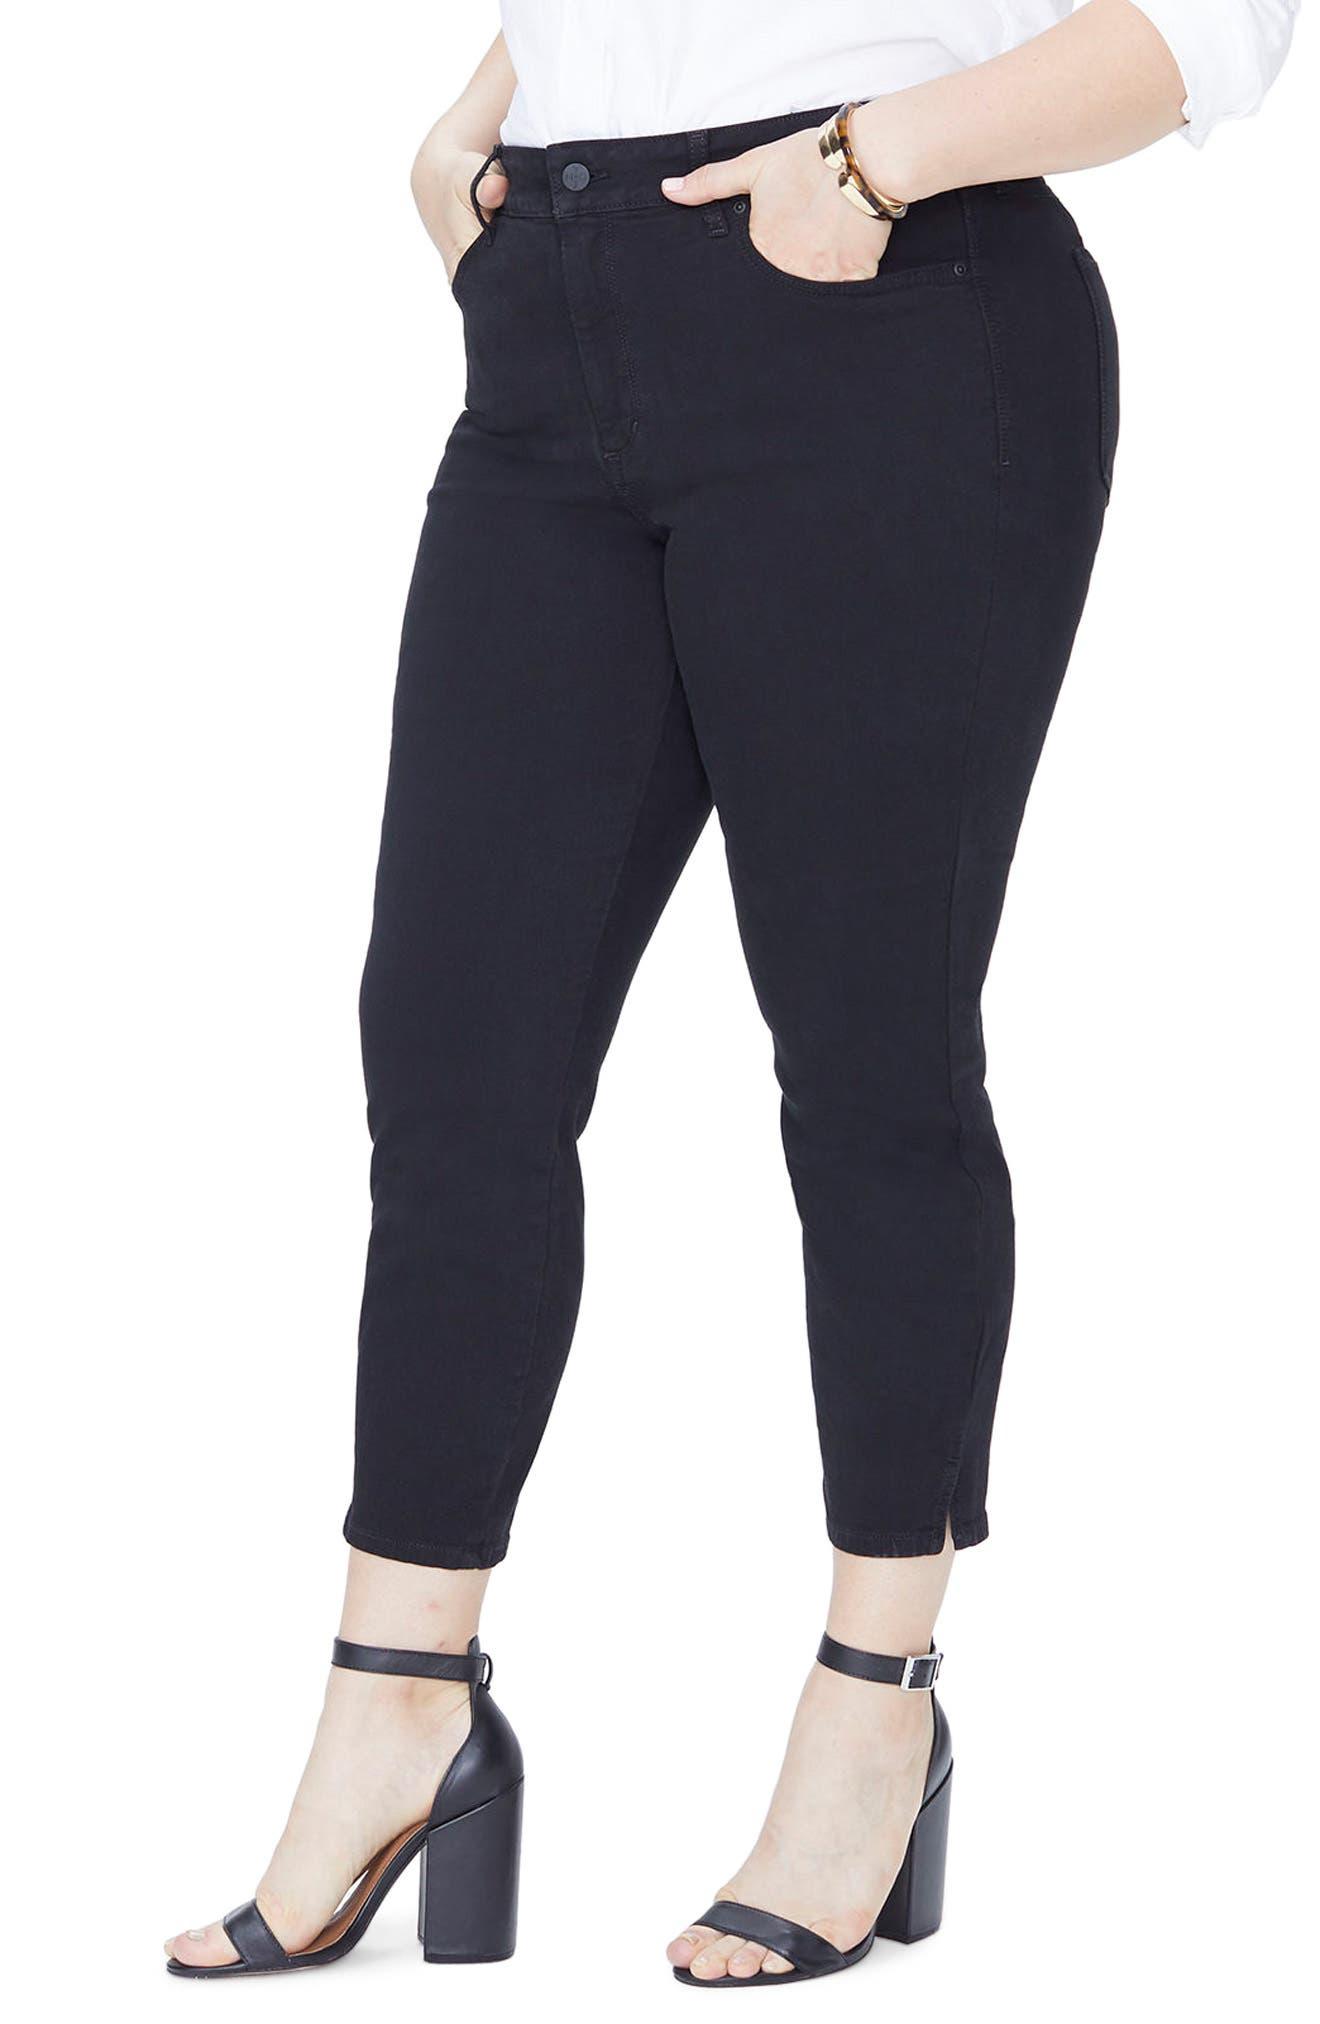 Ami Ankle Skinny Jeans,                         Main,                         color, Black